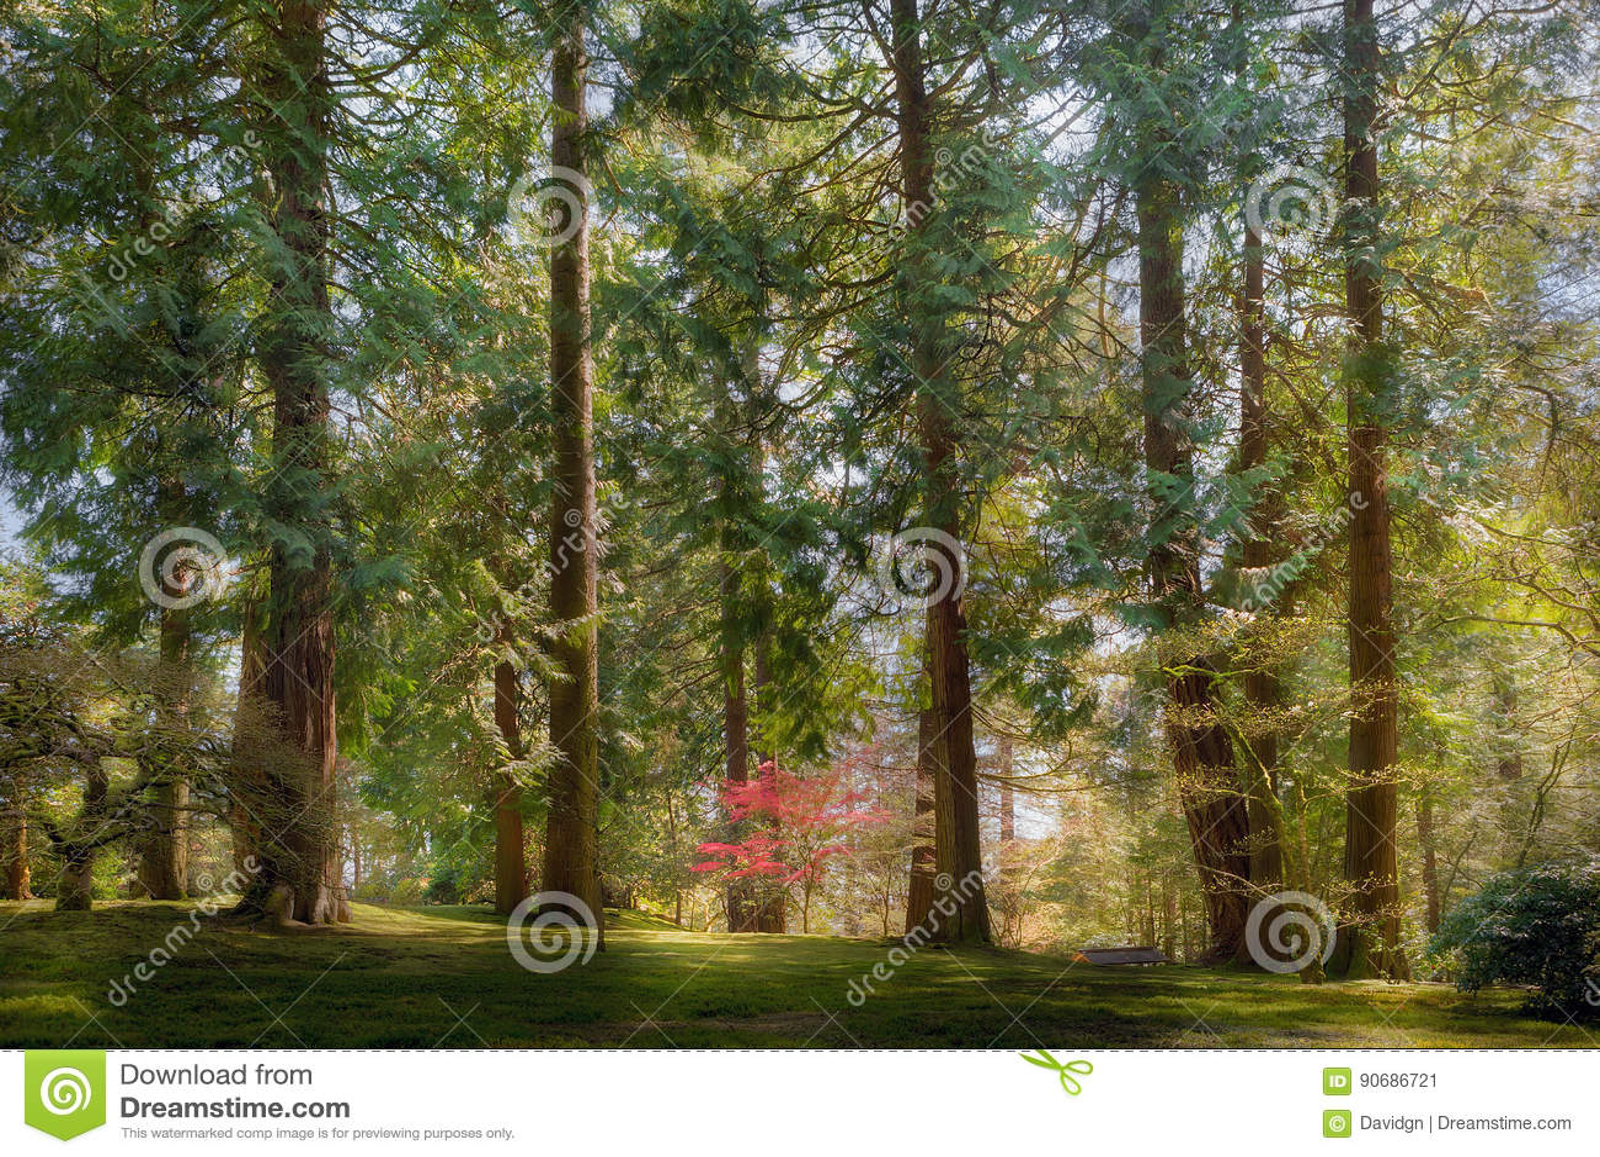 Standing Tall Amongst The Giants Trees In Portland Japanese Garden ...